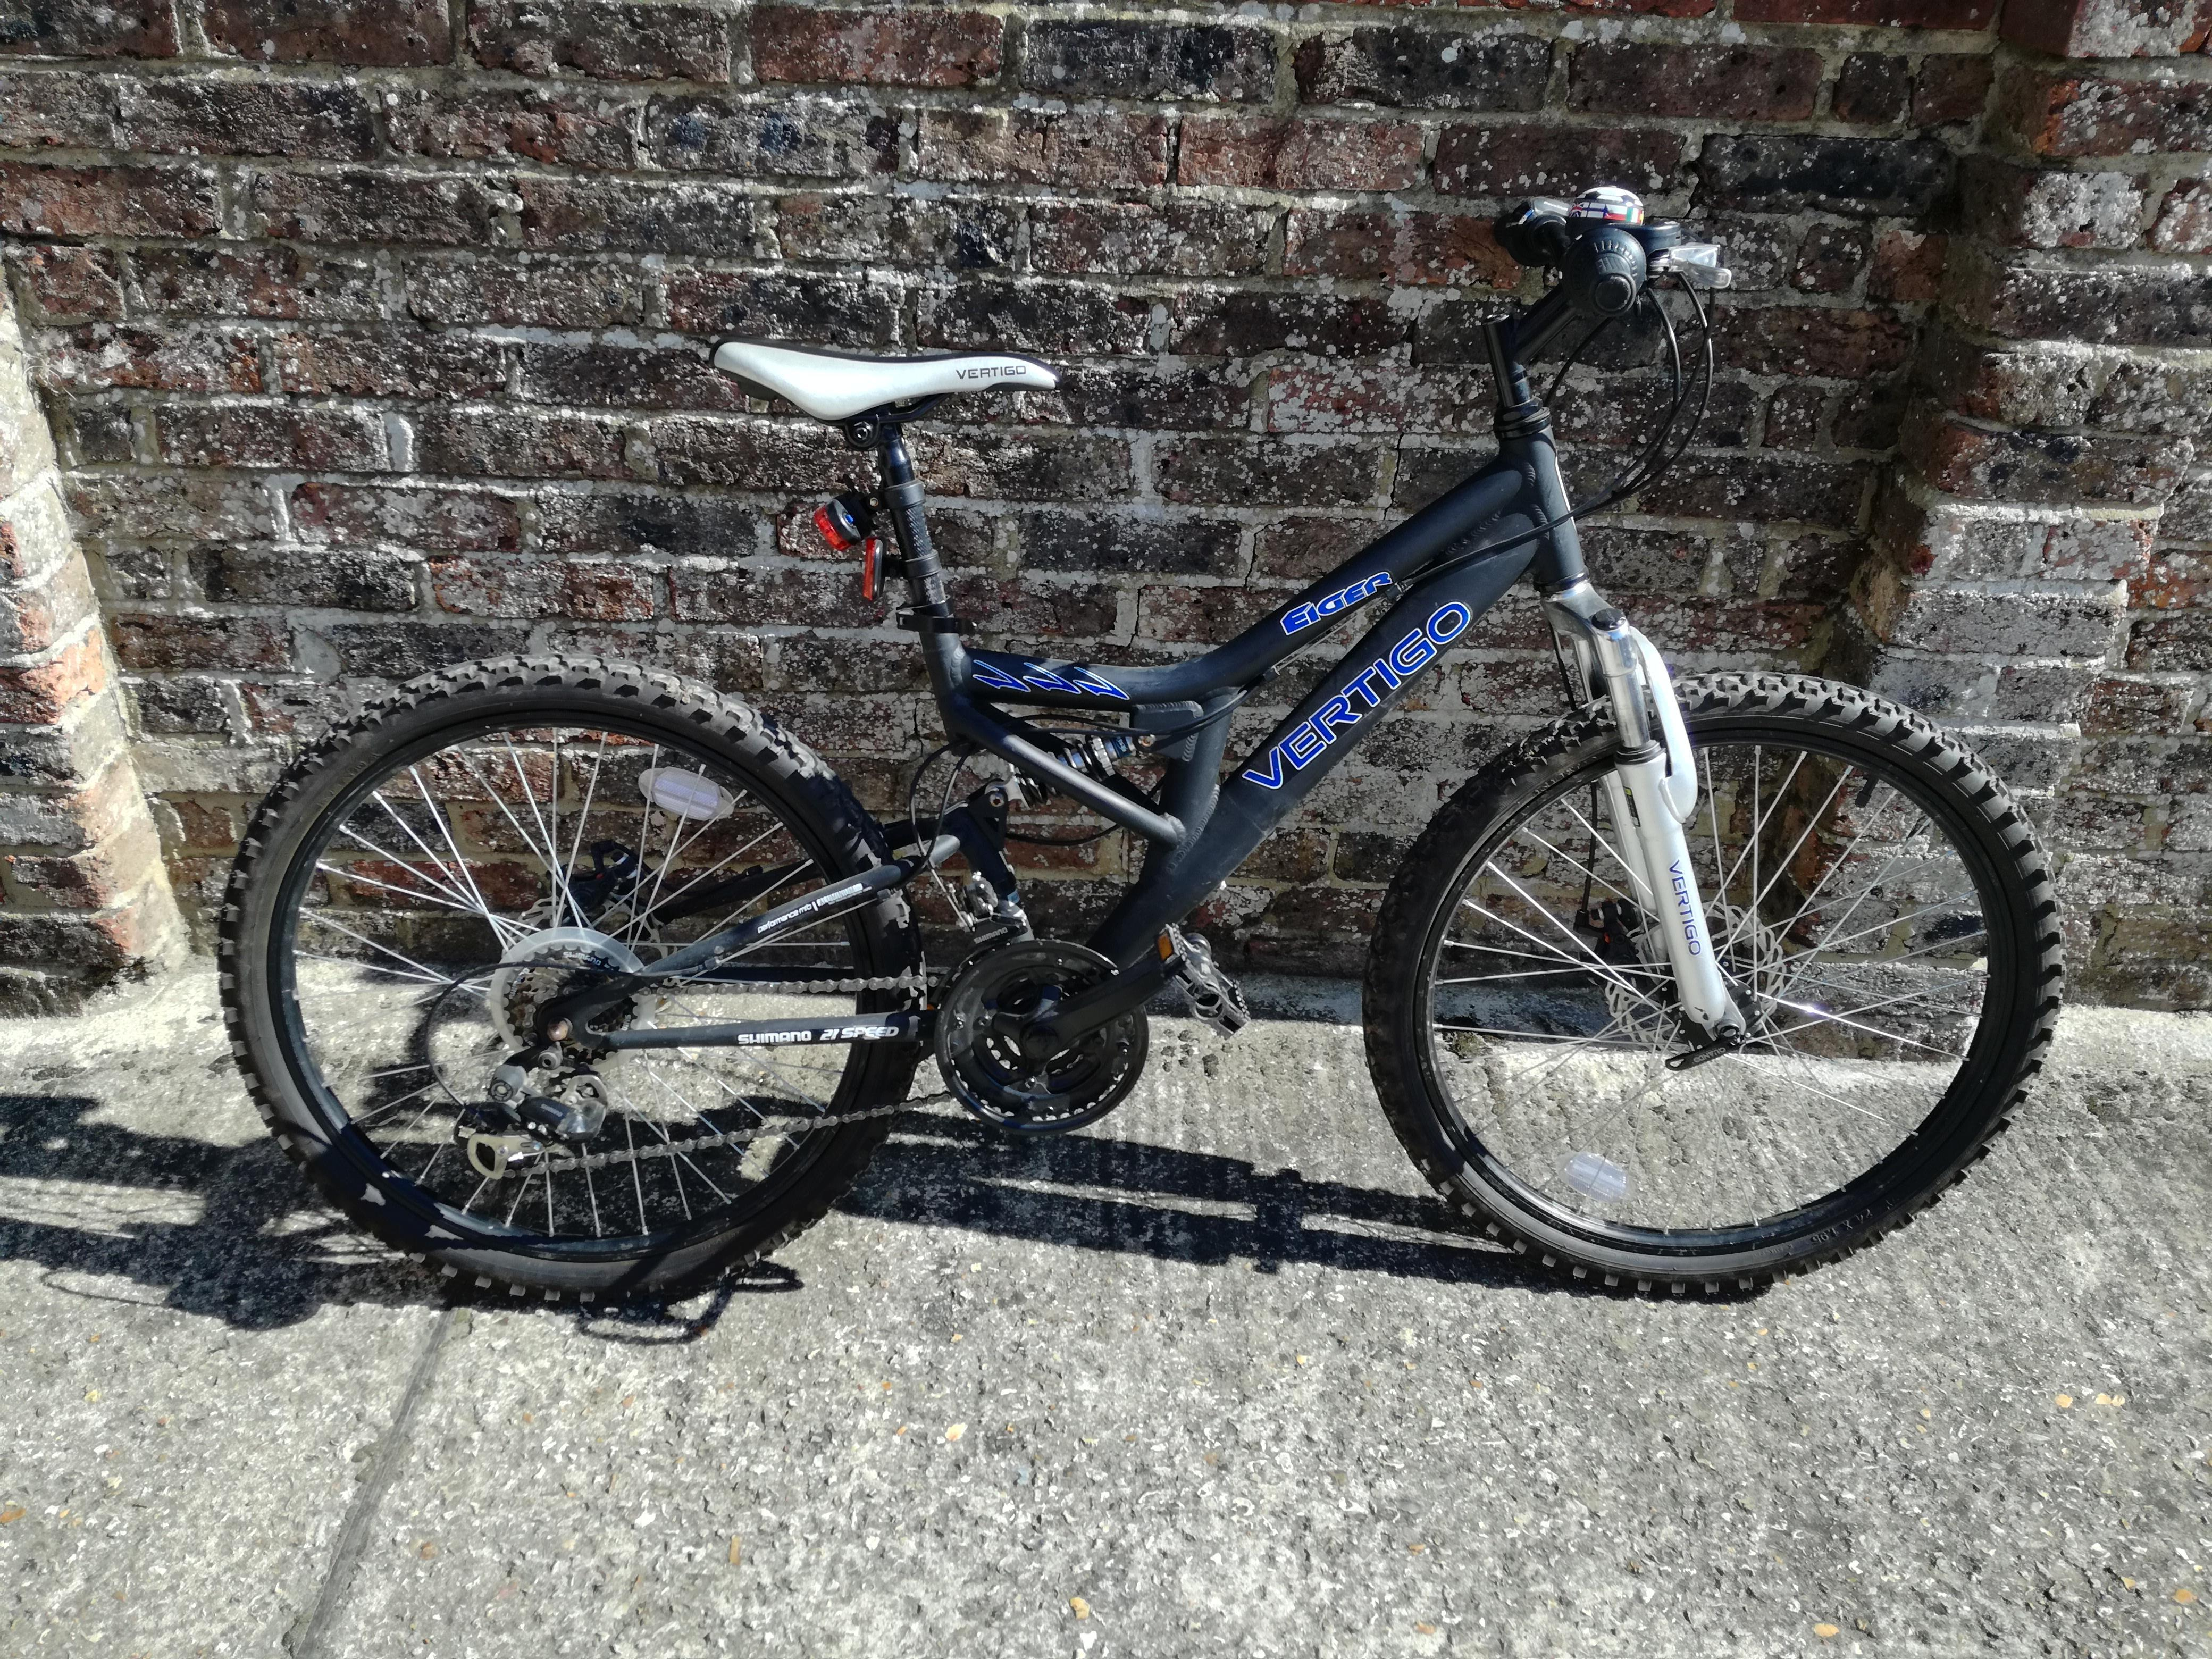 Dual suspension mountain bike 14 inch frame